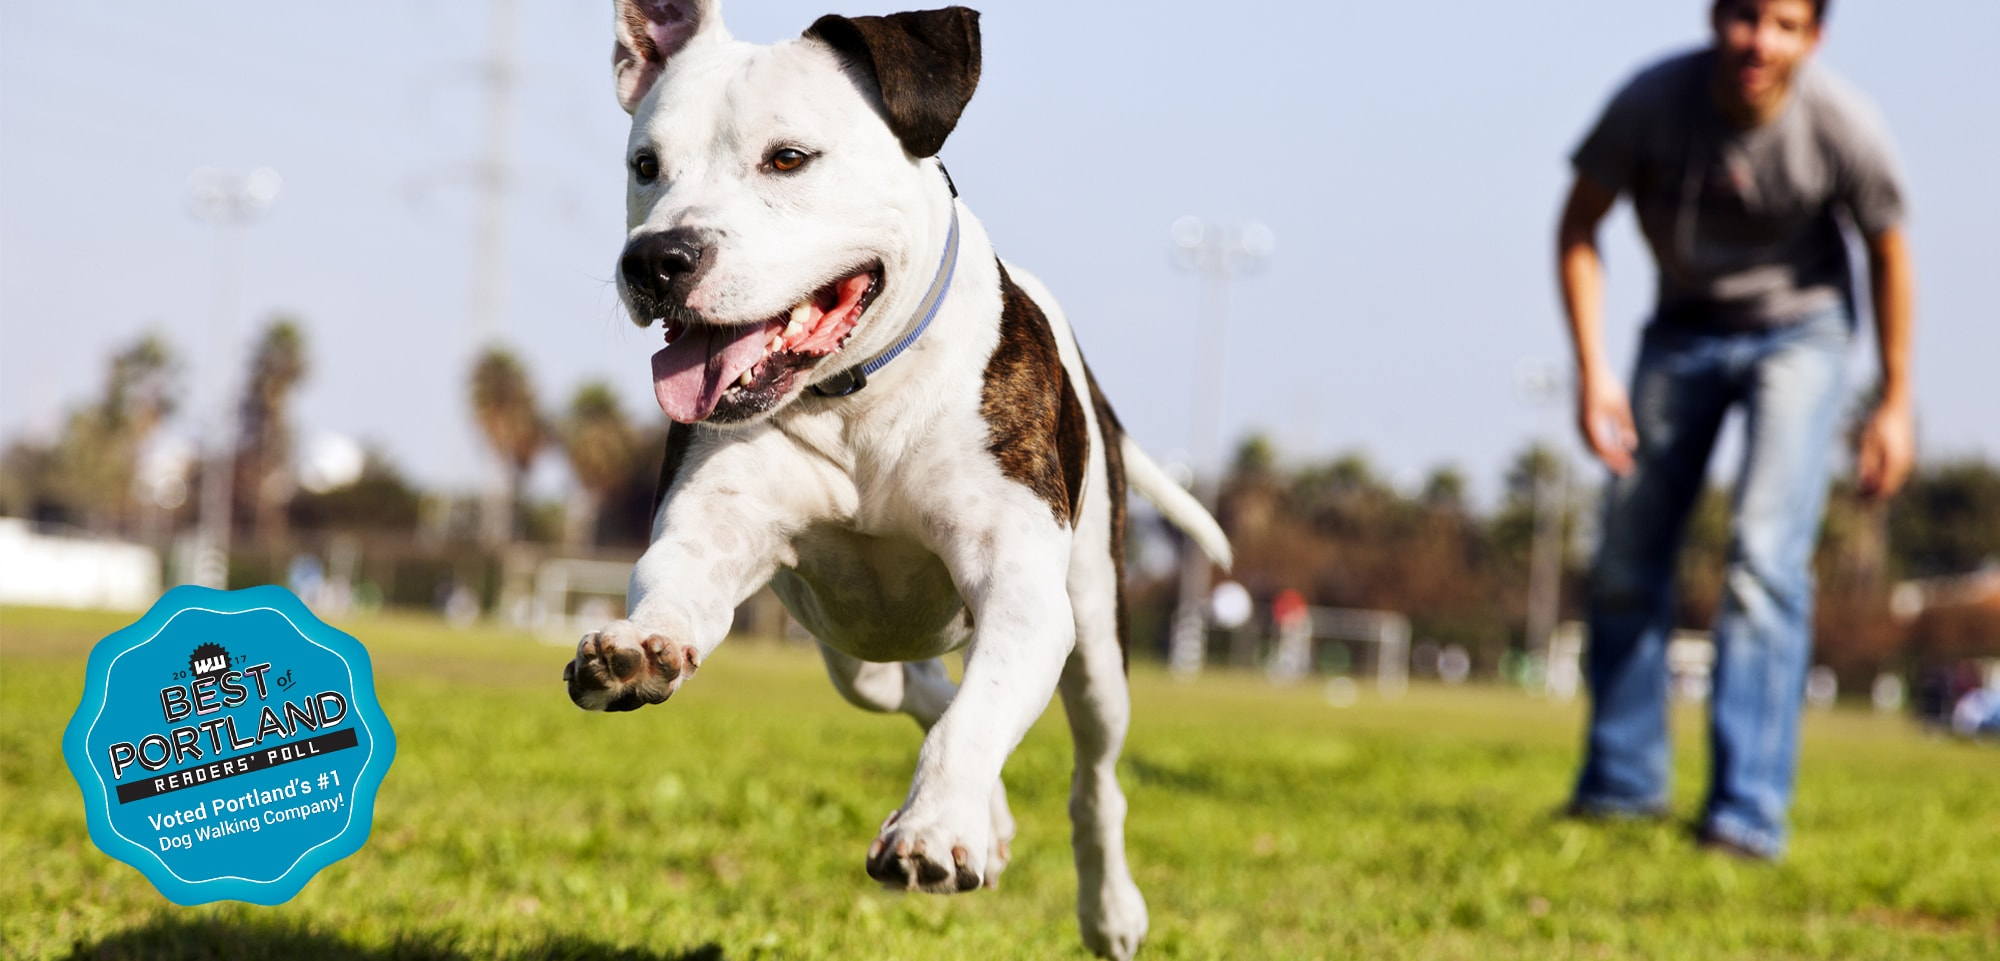 Hot Diggity Dog Walking Pet Sitting Services